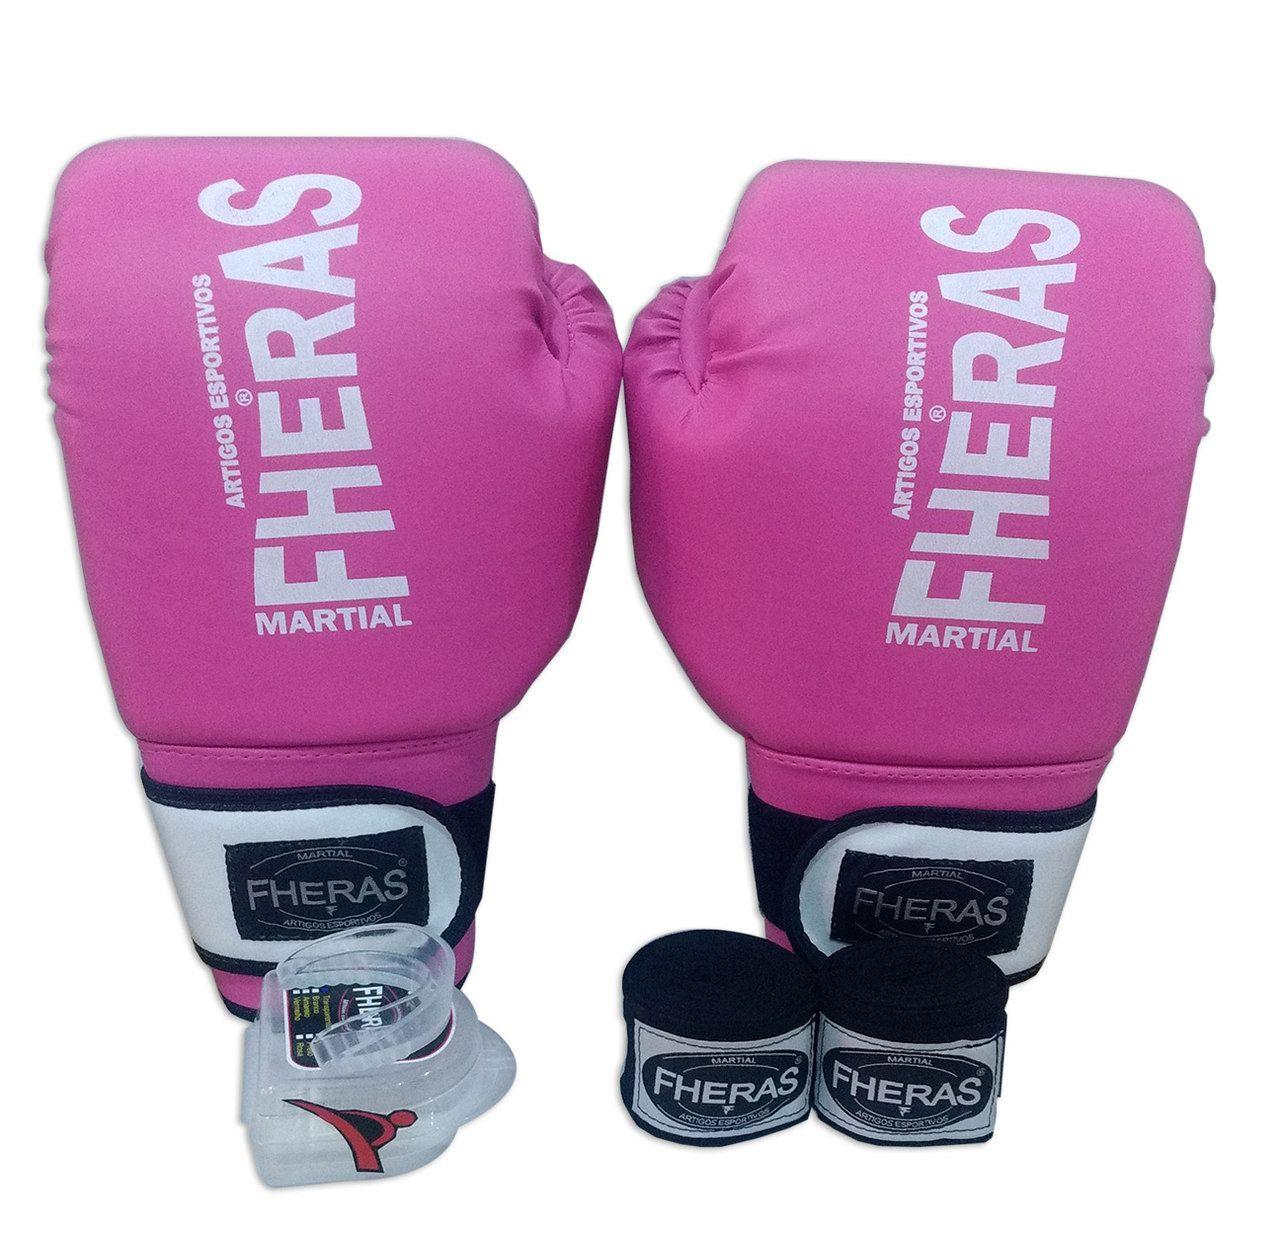 Kit de Boxe / Muay Thai Feminino 12oz - Rosa com branco - Fheras  - PRALUTA SHOP